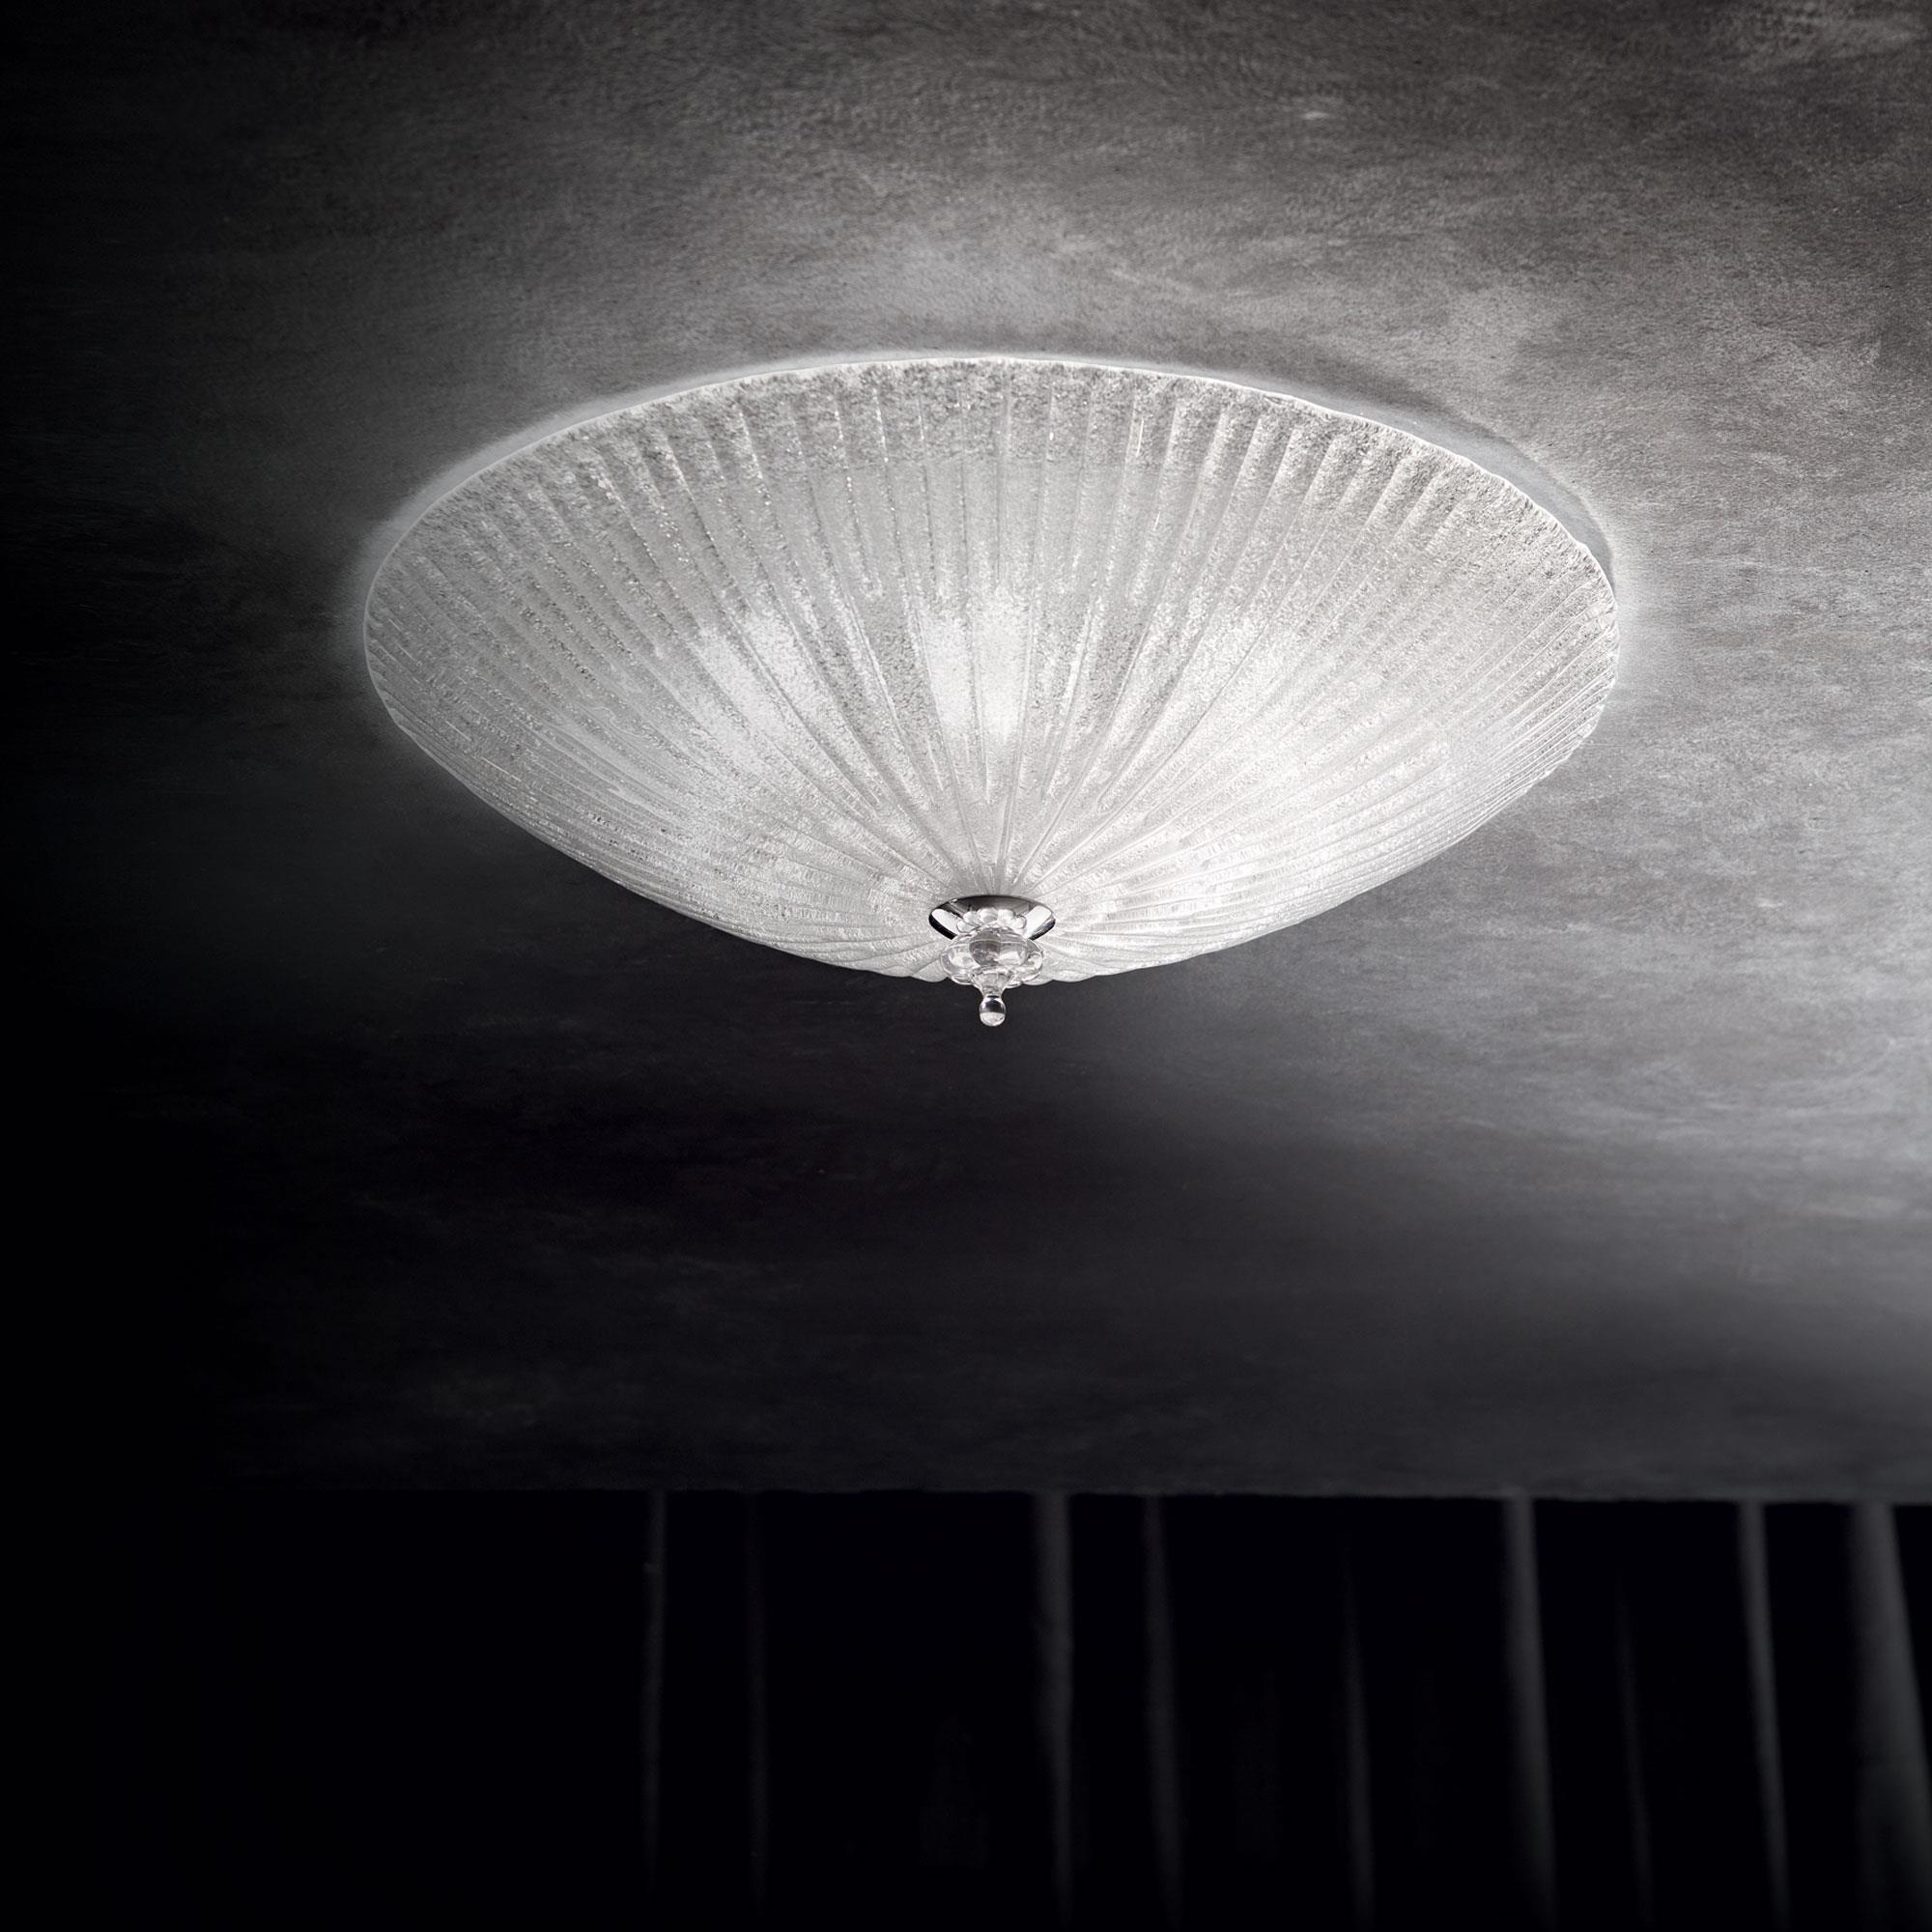 Ideal Lux 008615 Shell PL4 Trasparente mennyezeti lámpa